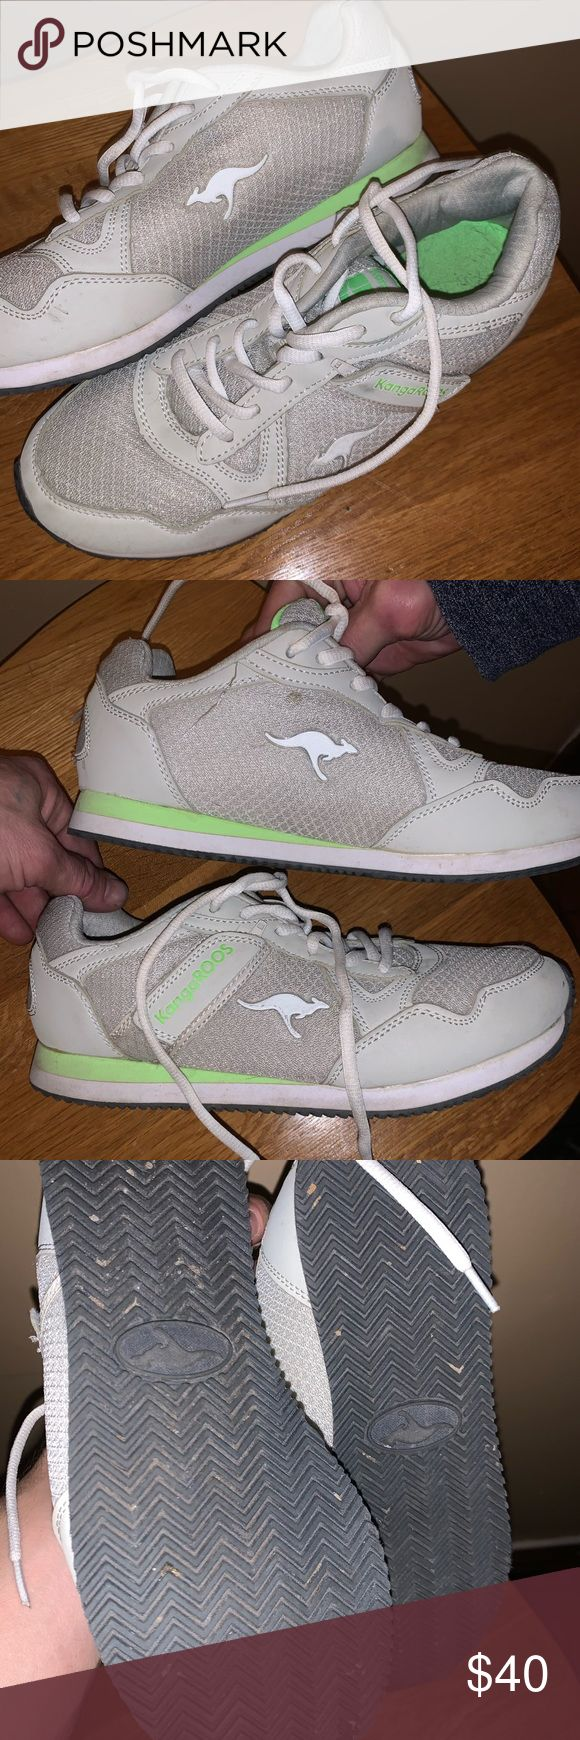 Kangaroos pocket shoes Kangaroo shoes, Womens shoes